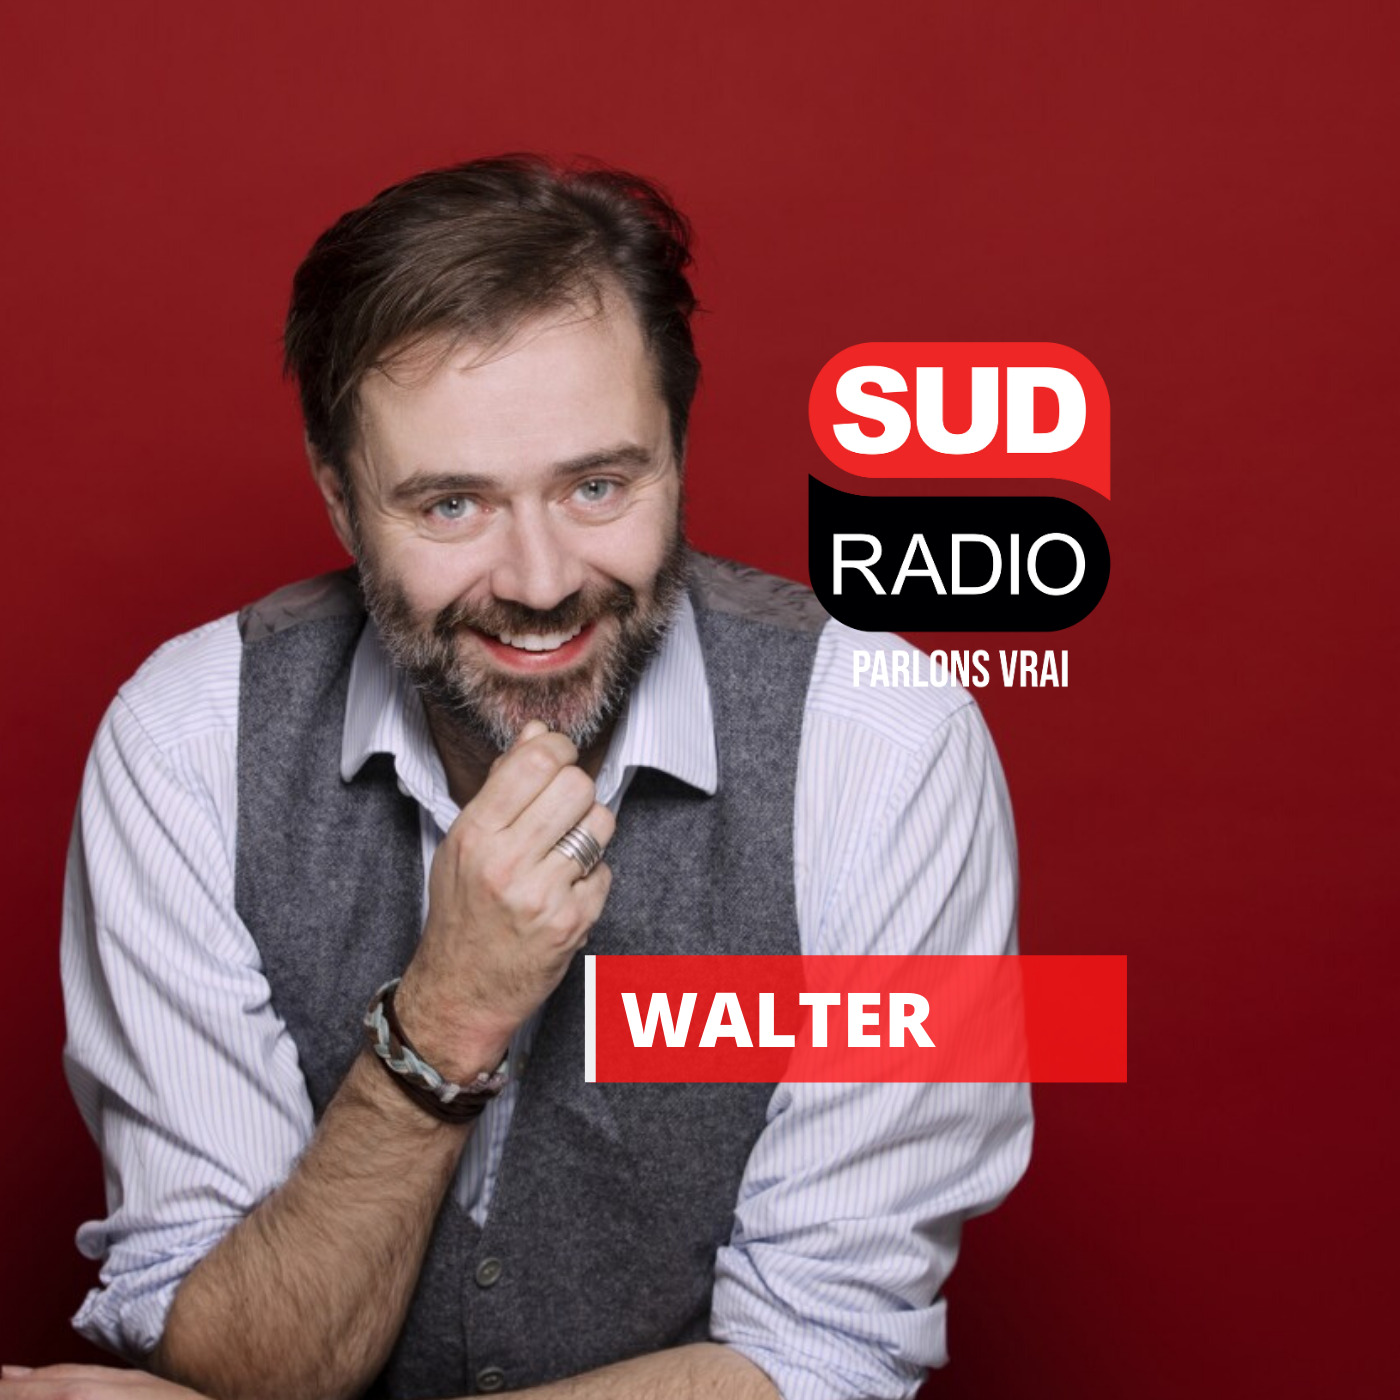 Image 1: Walter